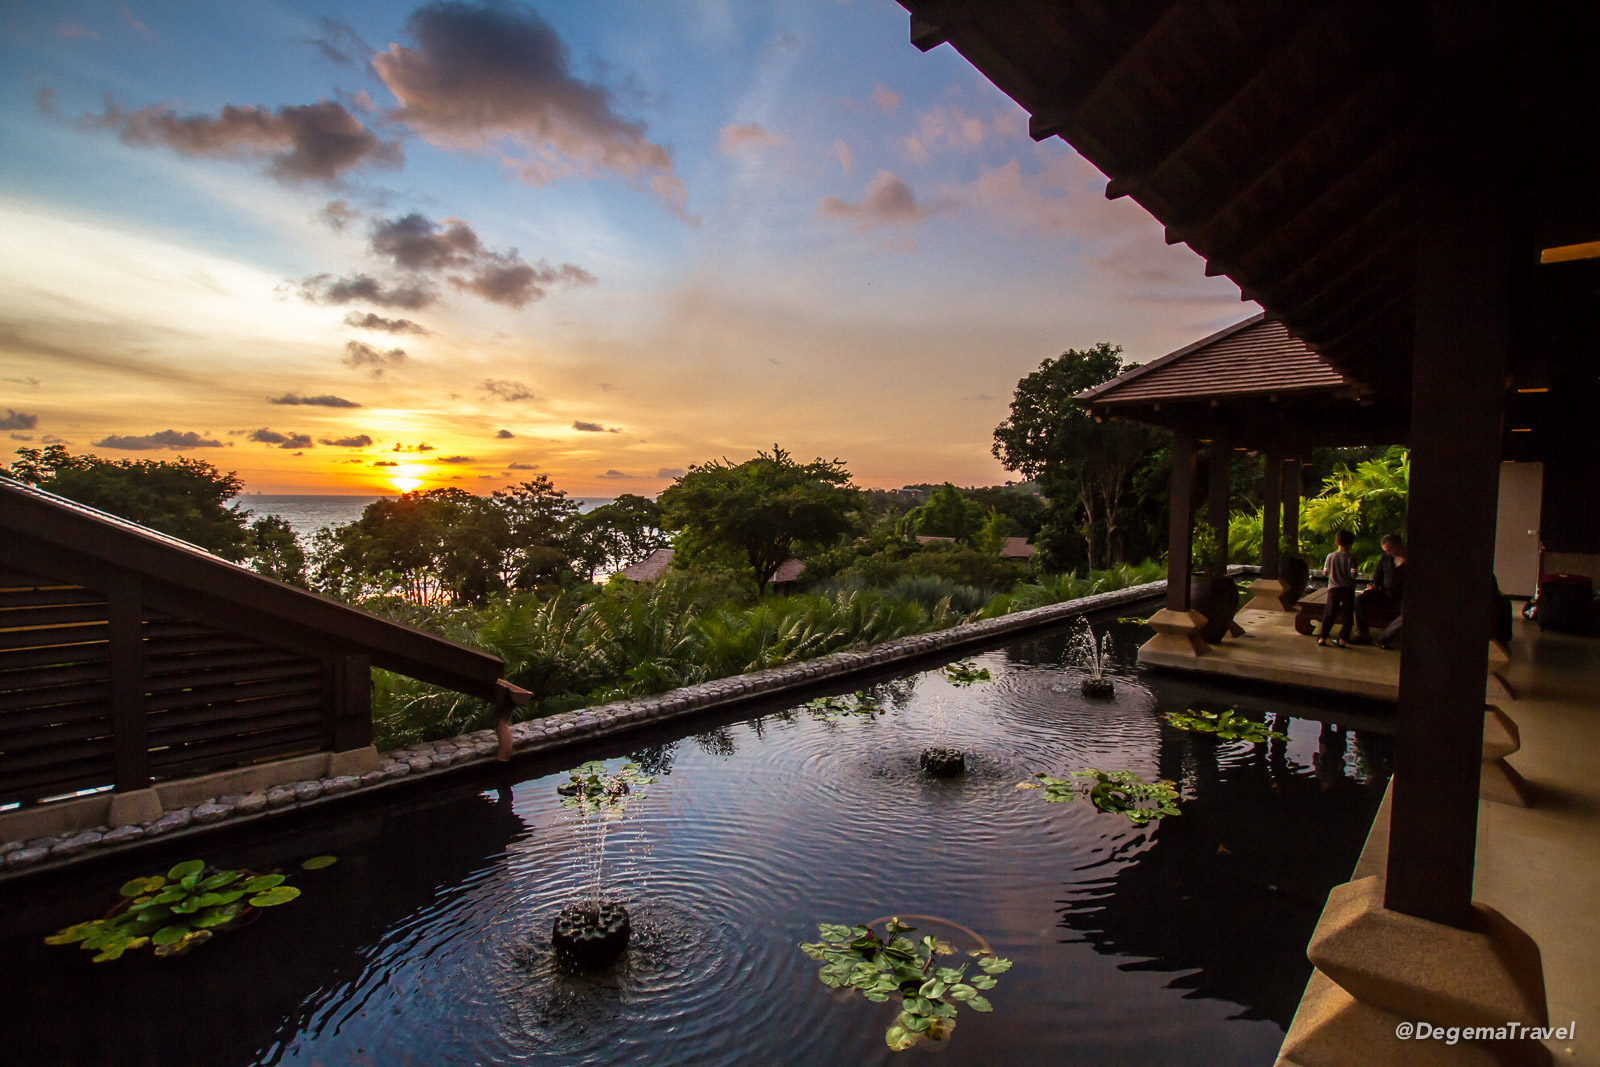 Sunset at reception at Pimalai Resort & Spa on Koh Lanta, Thailand